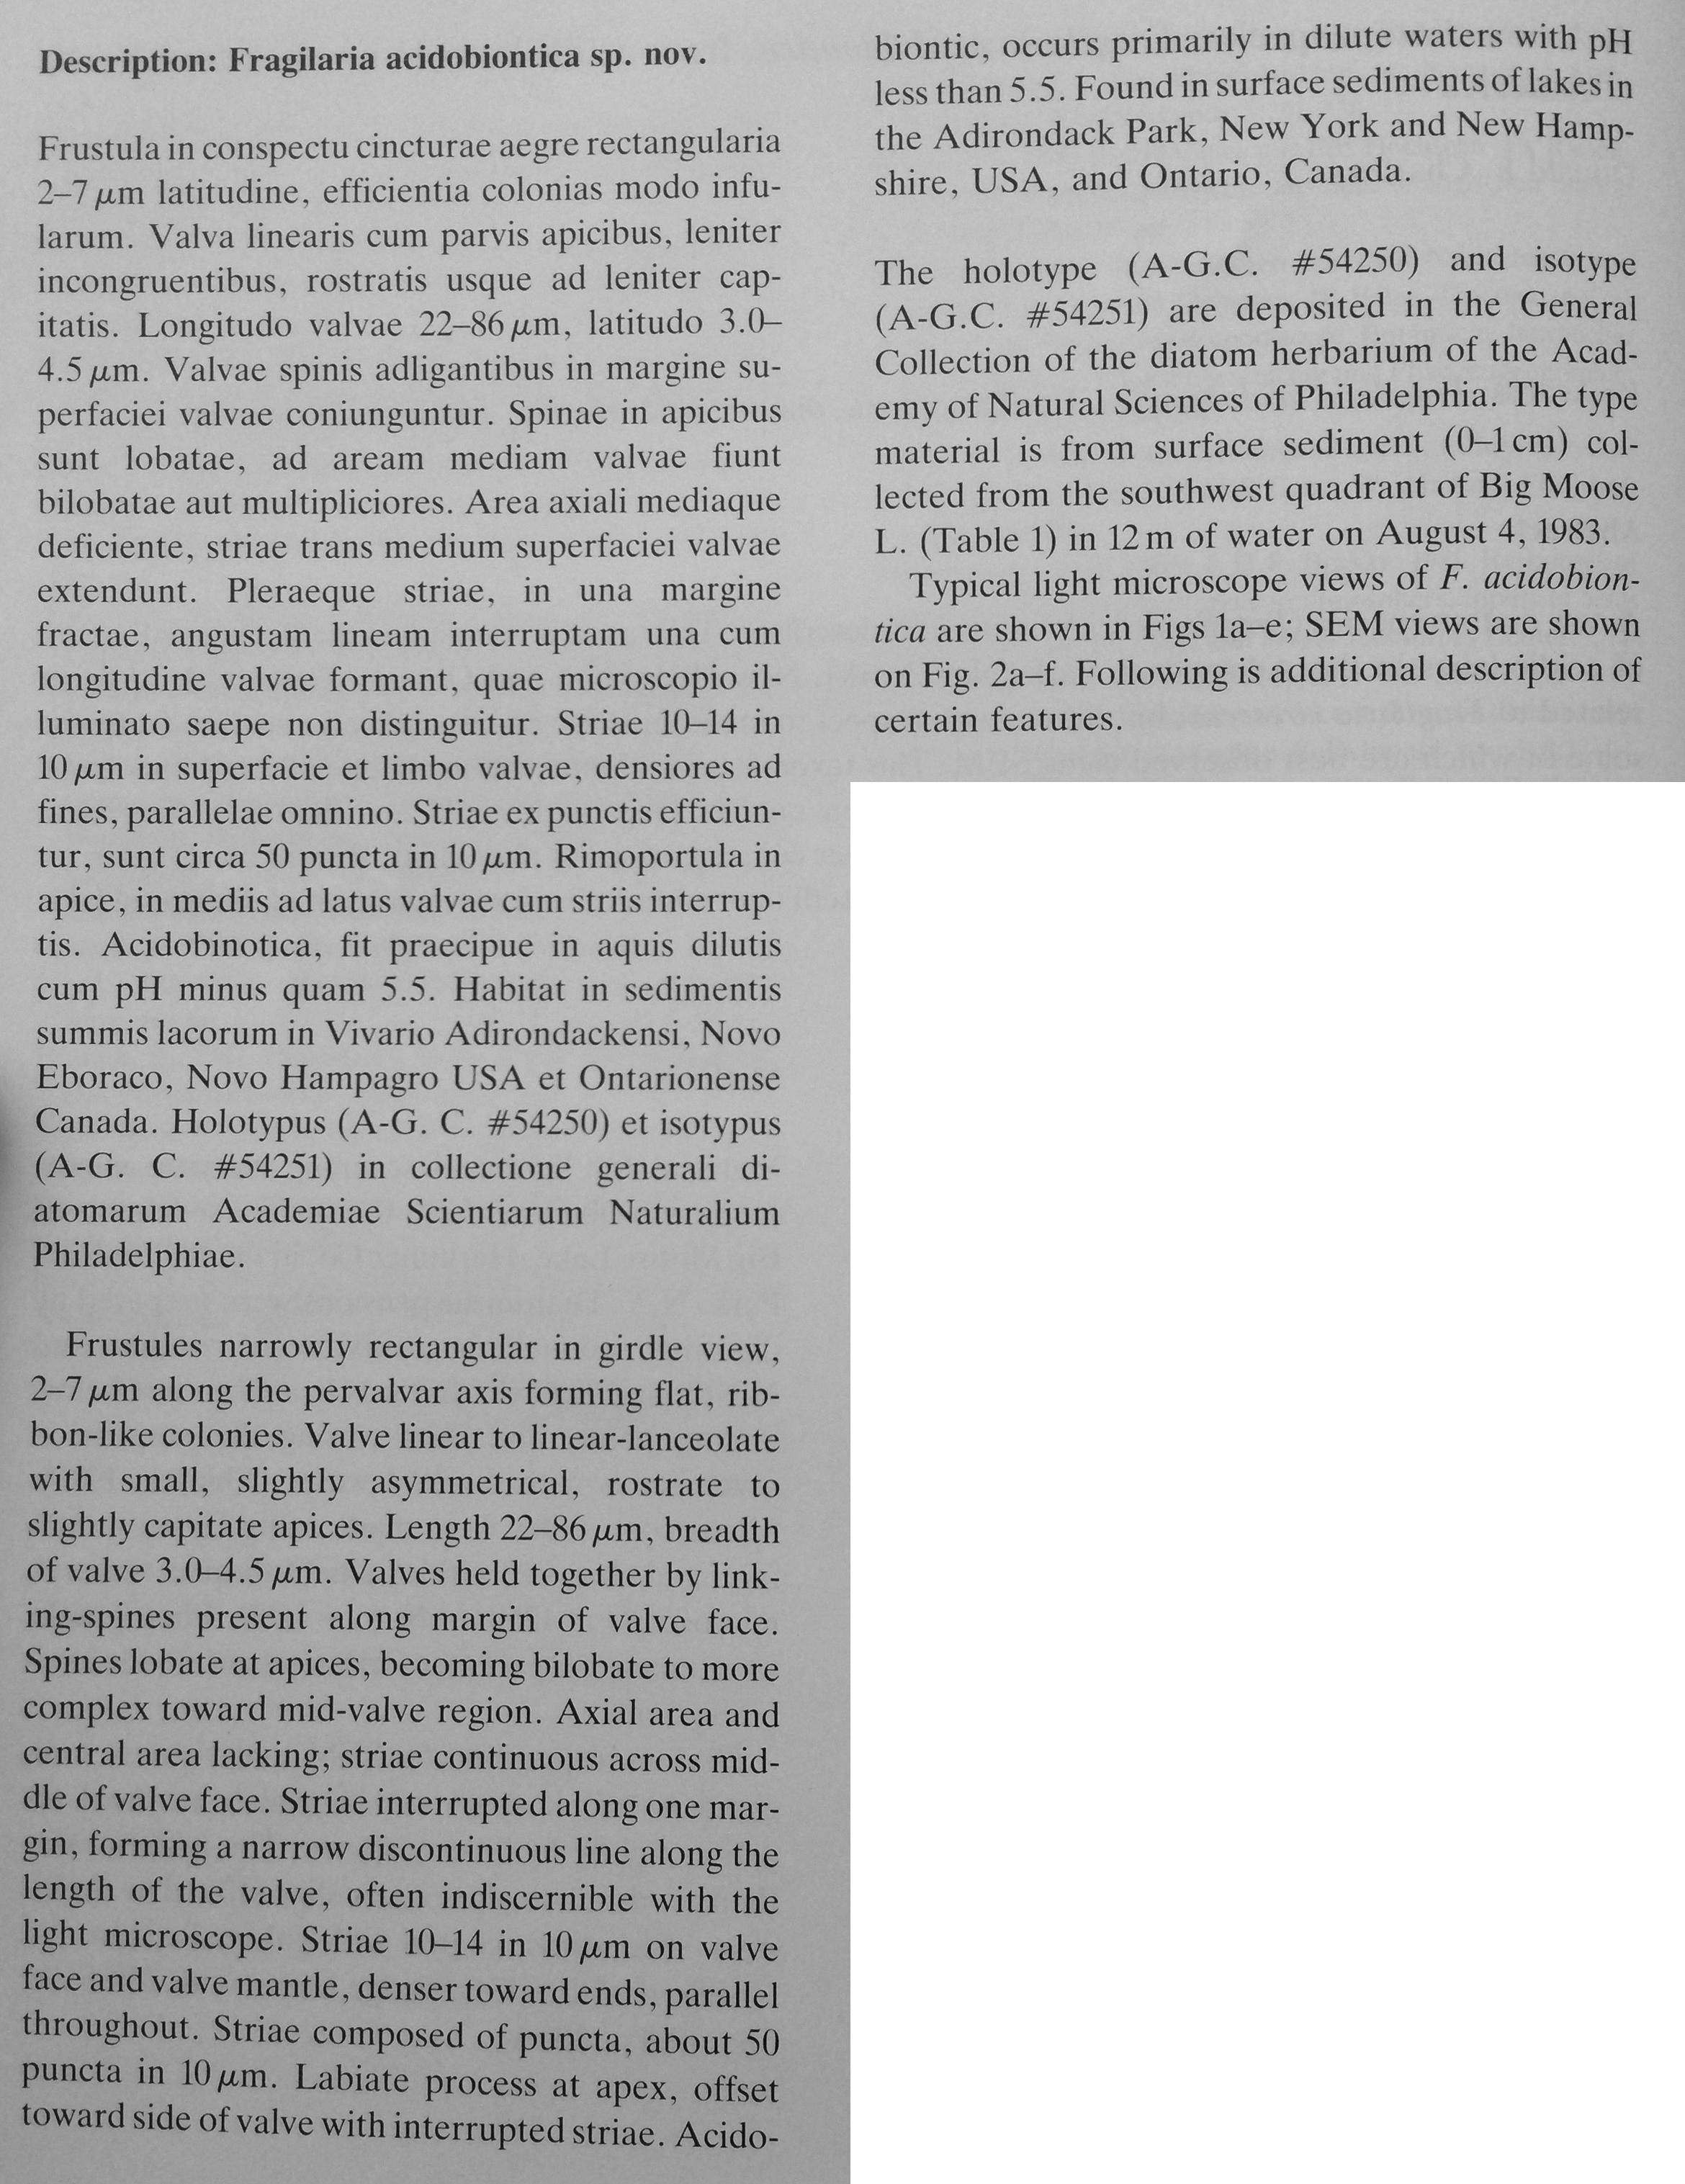 Fracidobiontic Original Description